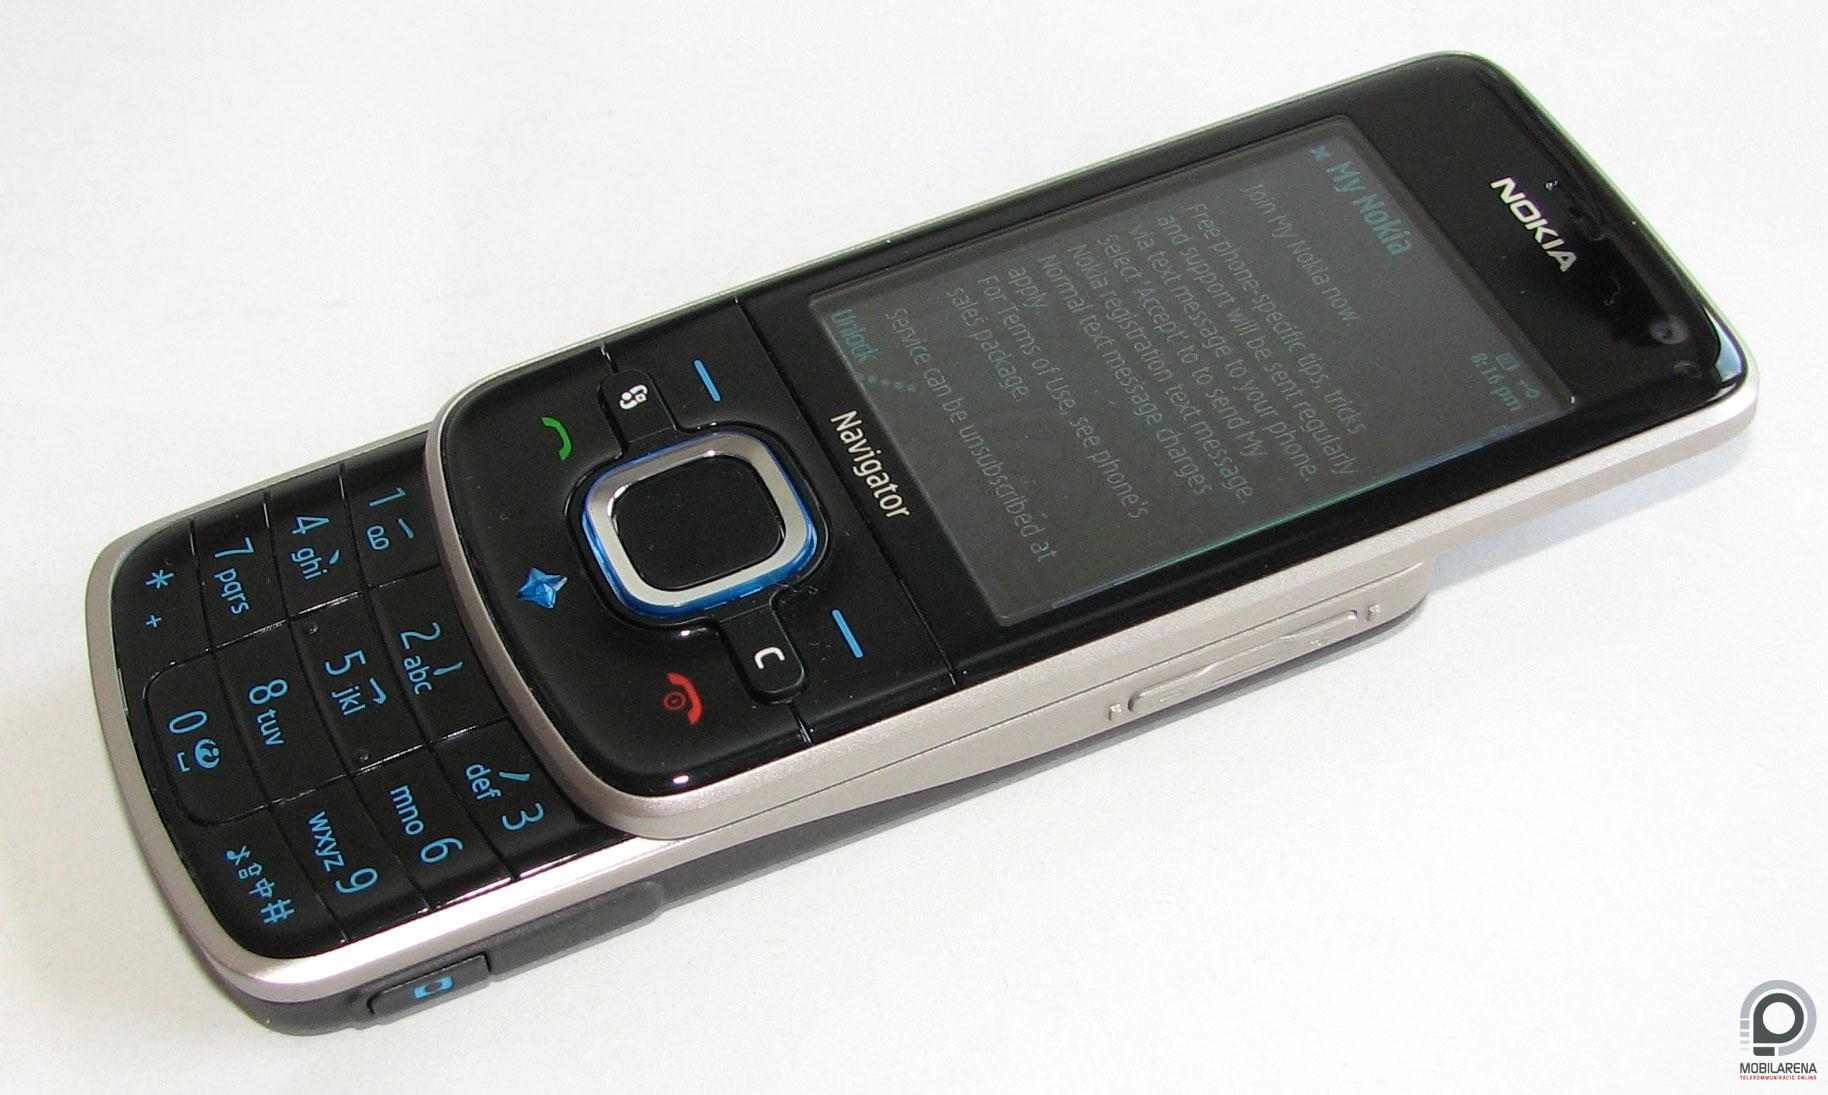 wifi nokia 6210 navigator